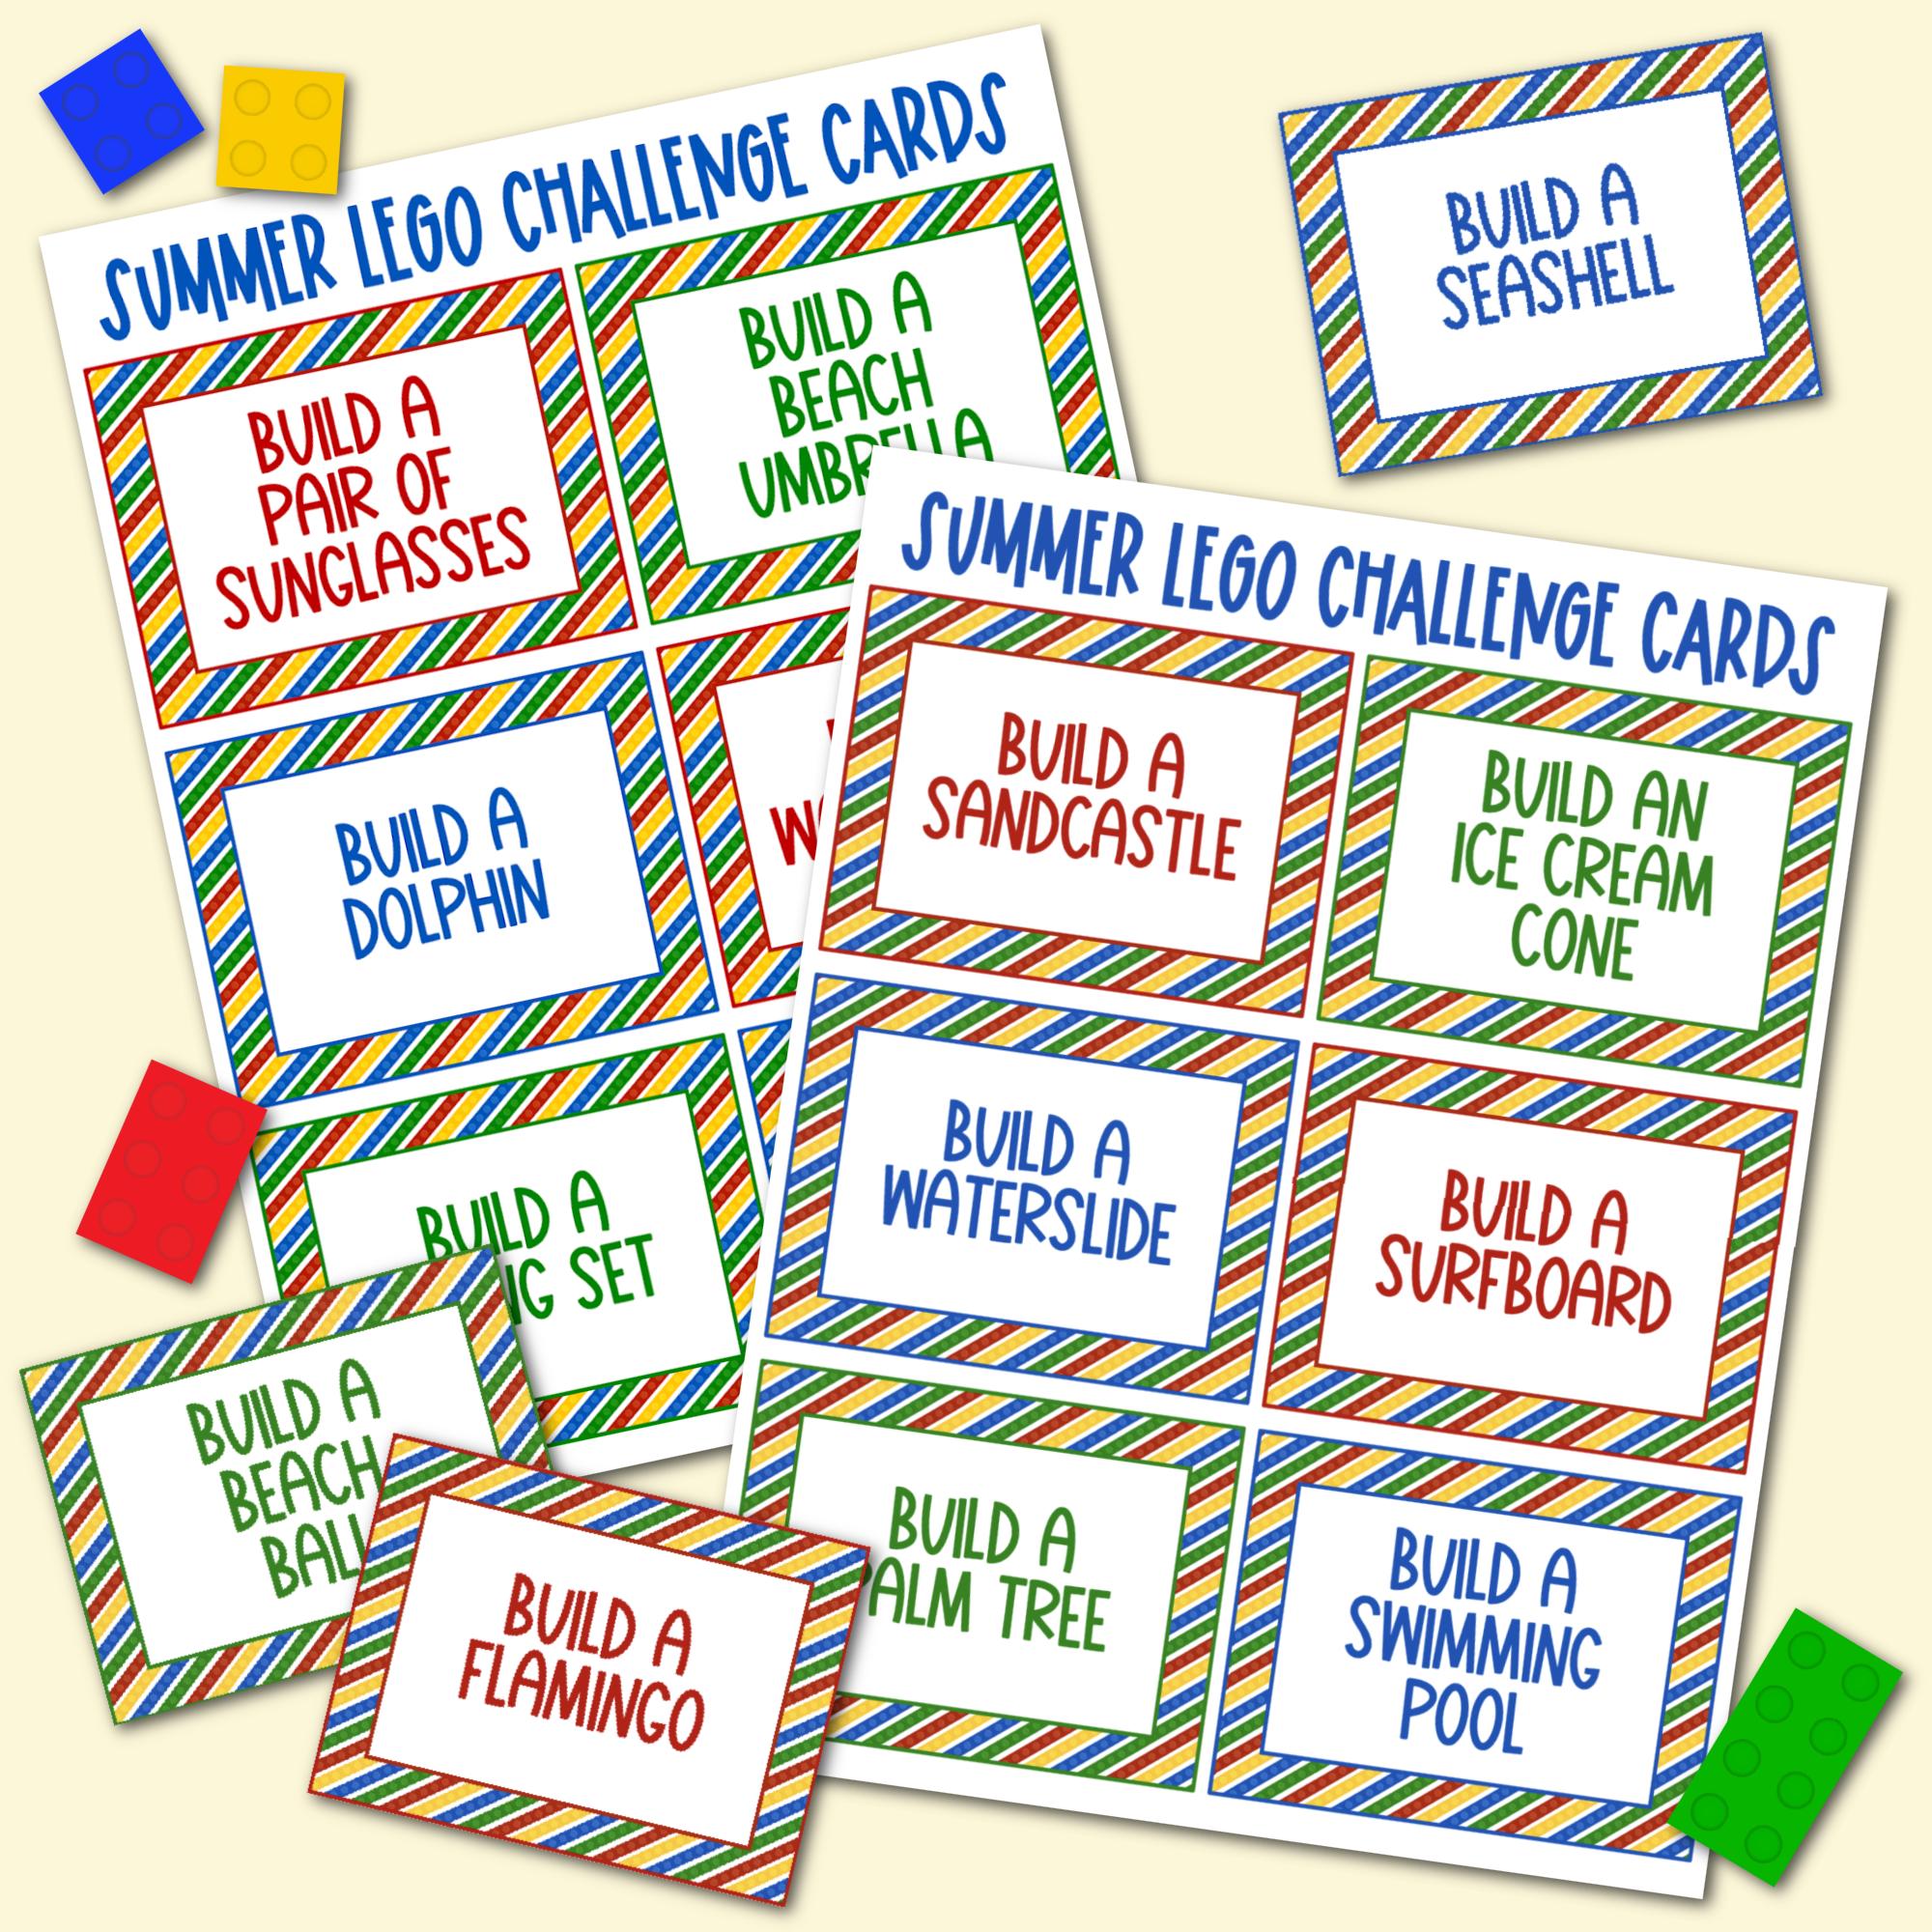 Summer LEGO Challenge Cards